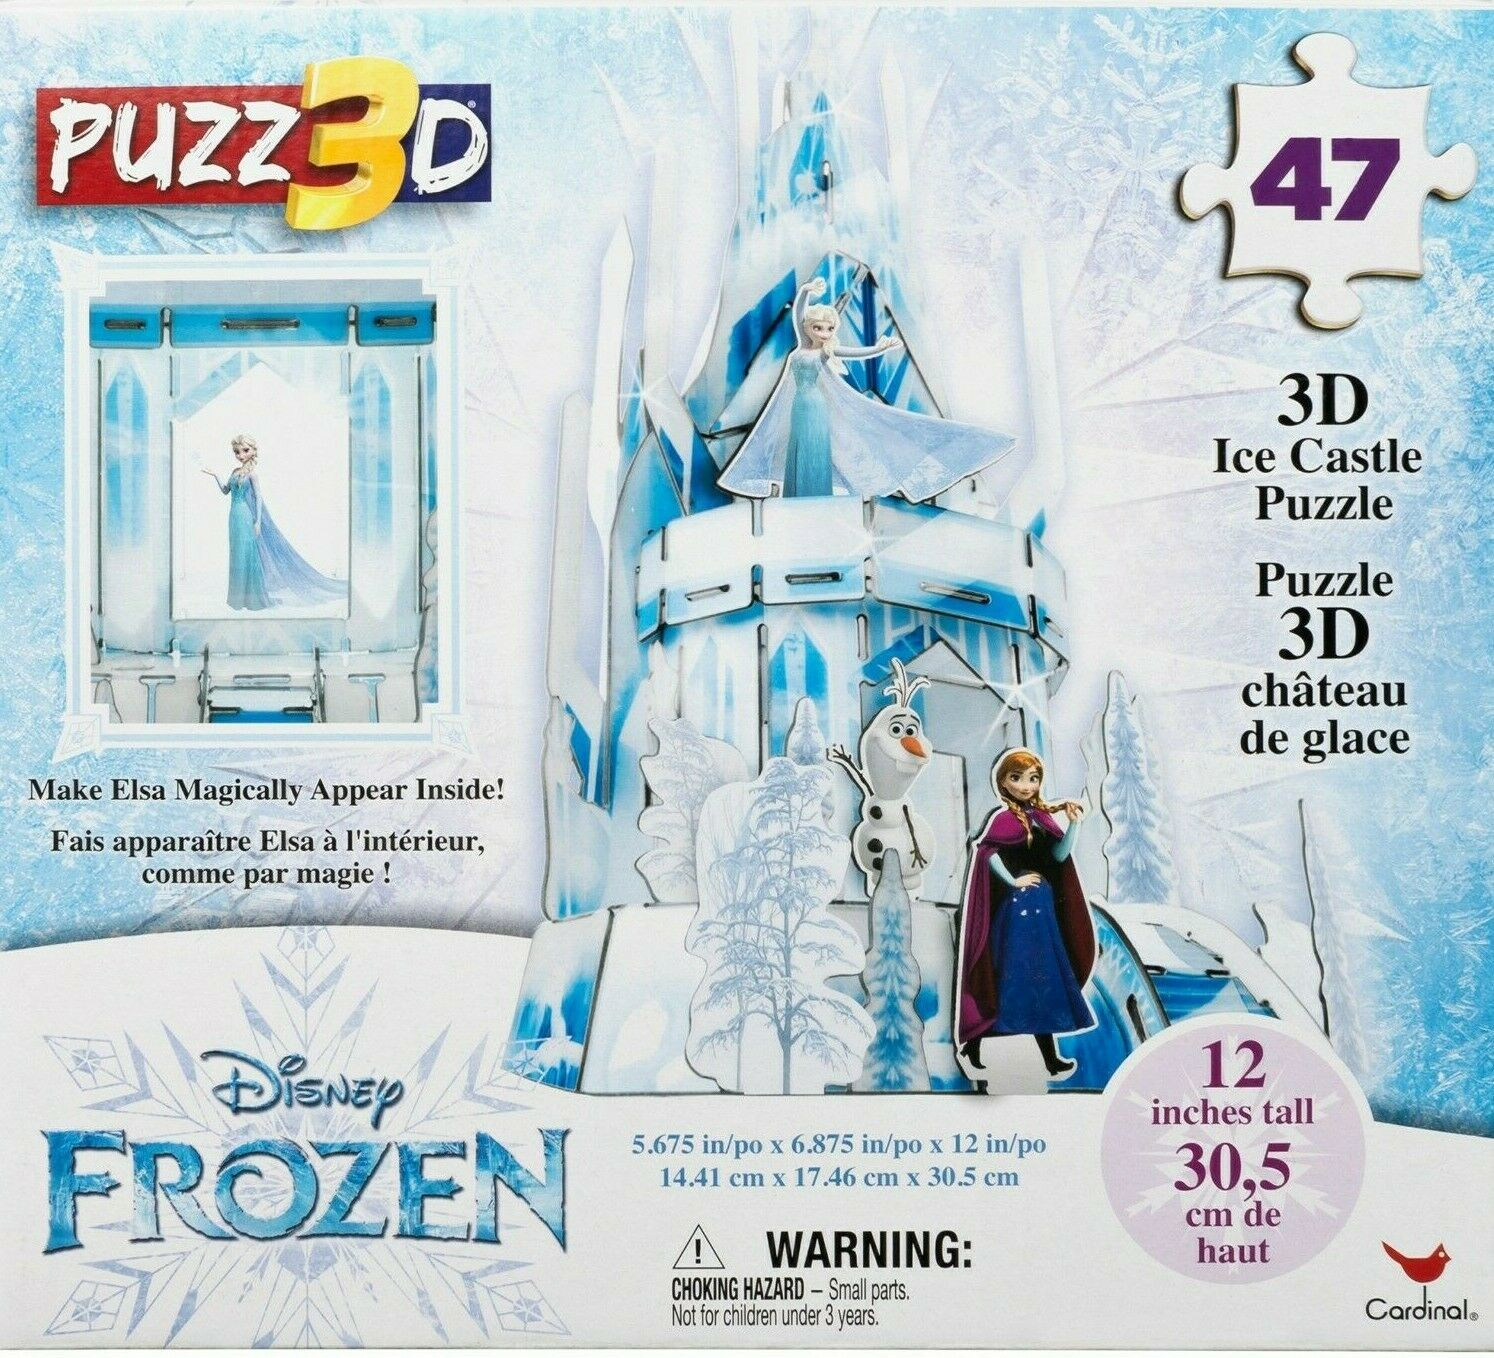 Frozen 3D Elsa Hologram Ice Castle Puzzle 47 Pieces 12 in Tall Ages 3+ - $18.05